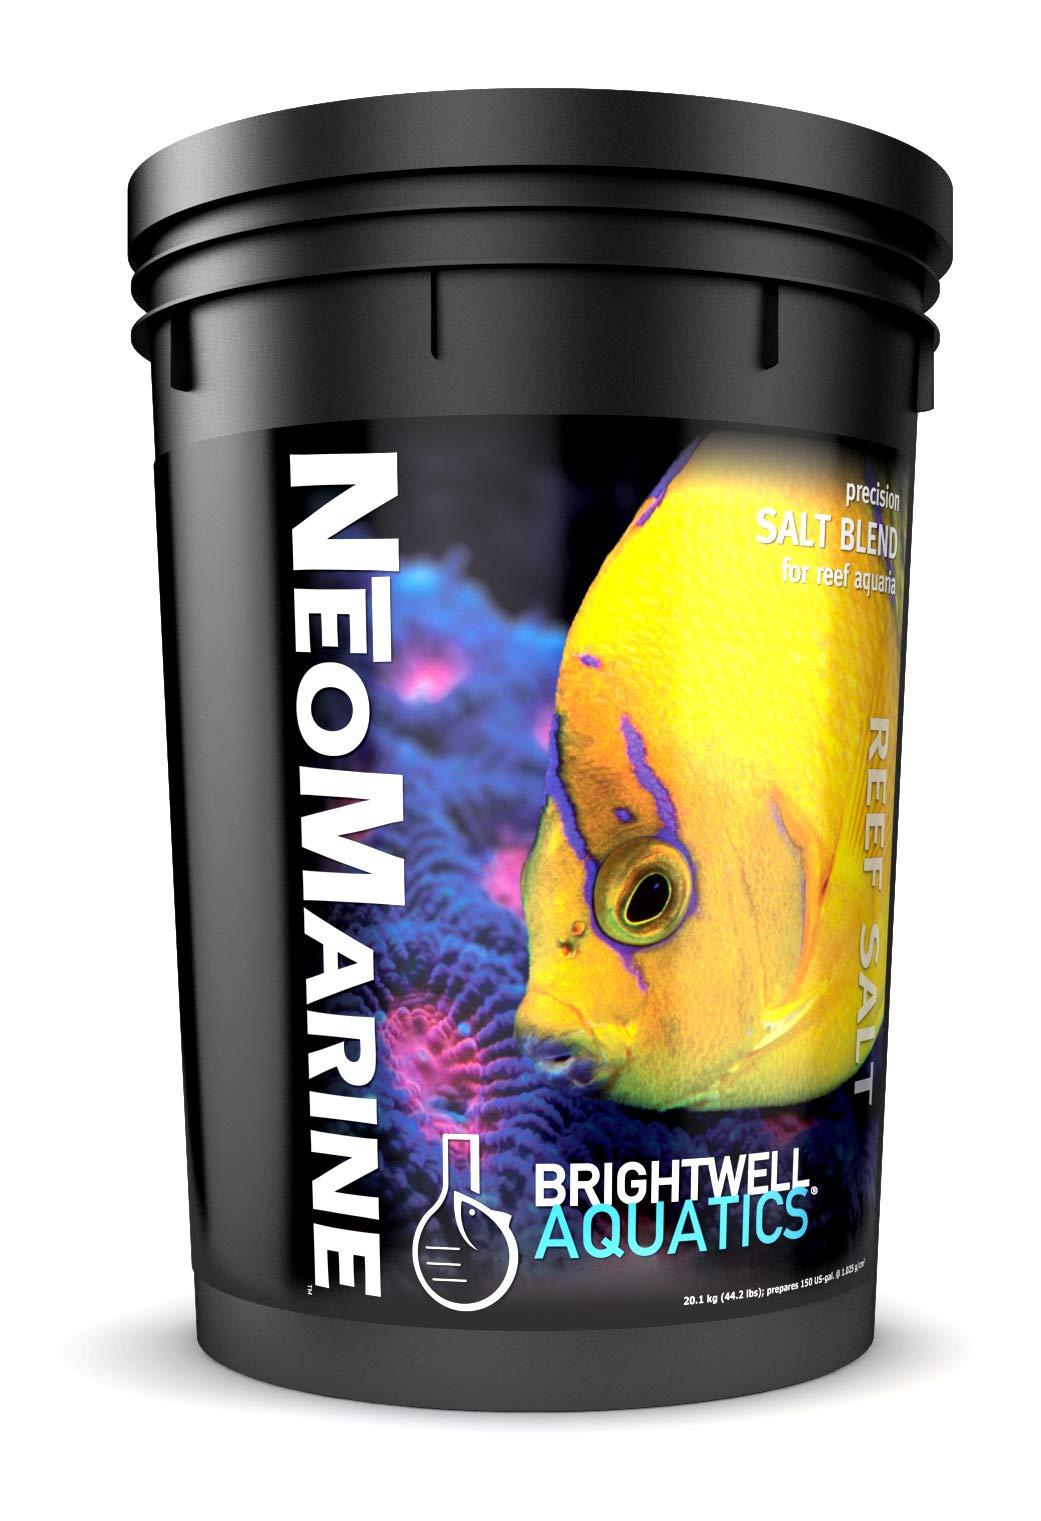 Brightwell Aquatics ABANMAR150 Neomarine Marine Salt for Aquarium, 150-Gallon by Brightwell Aquatics